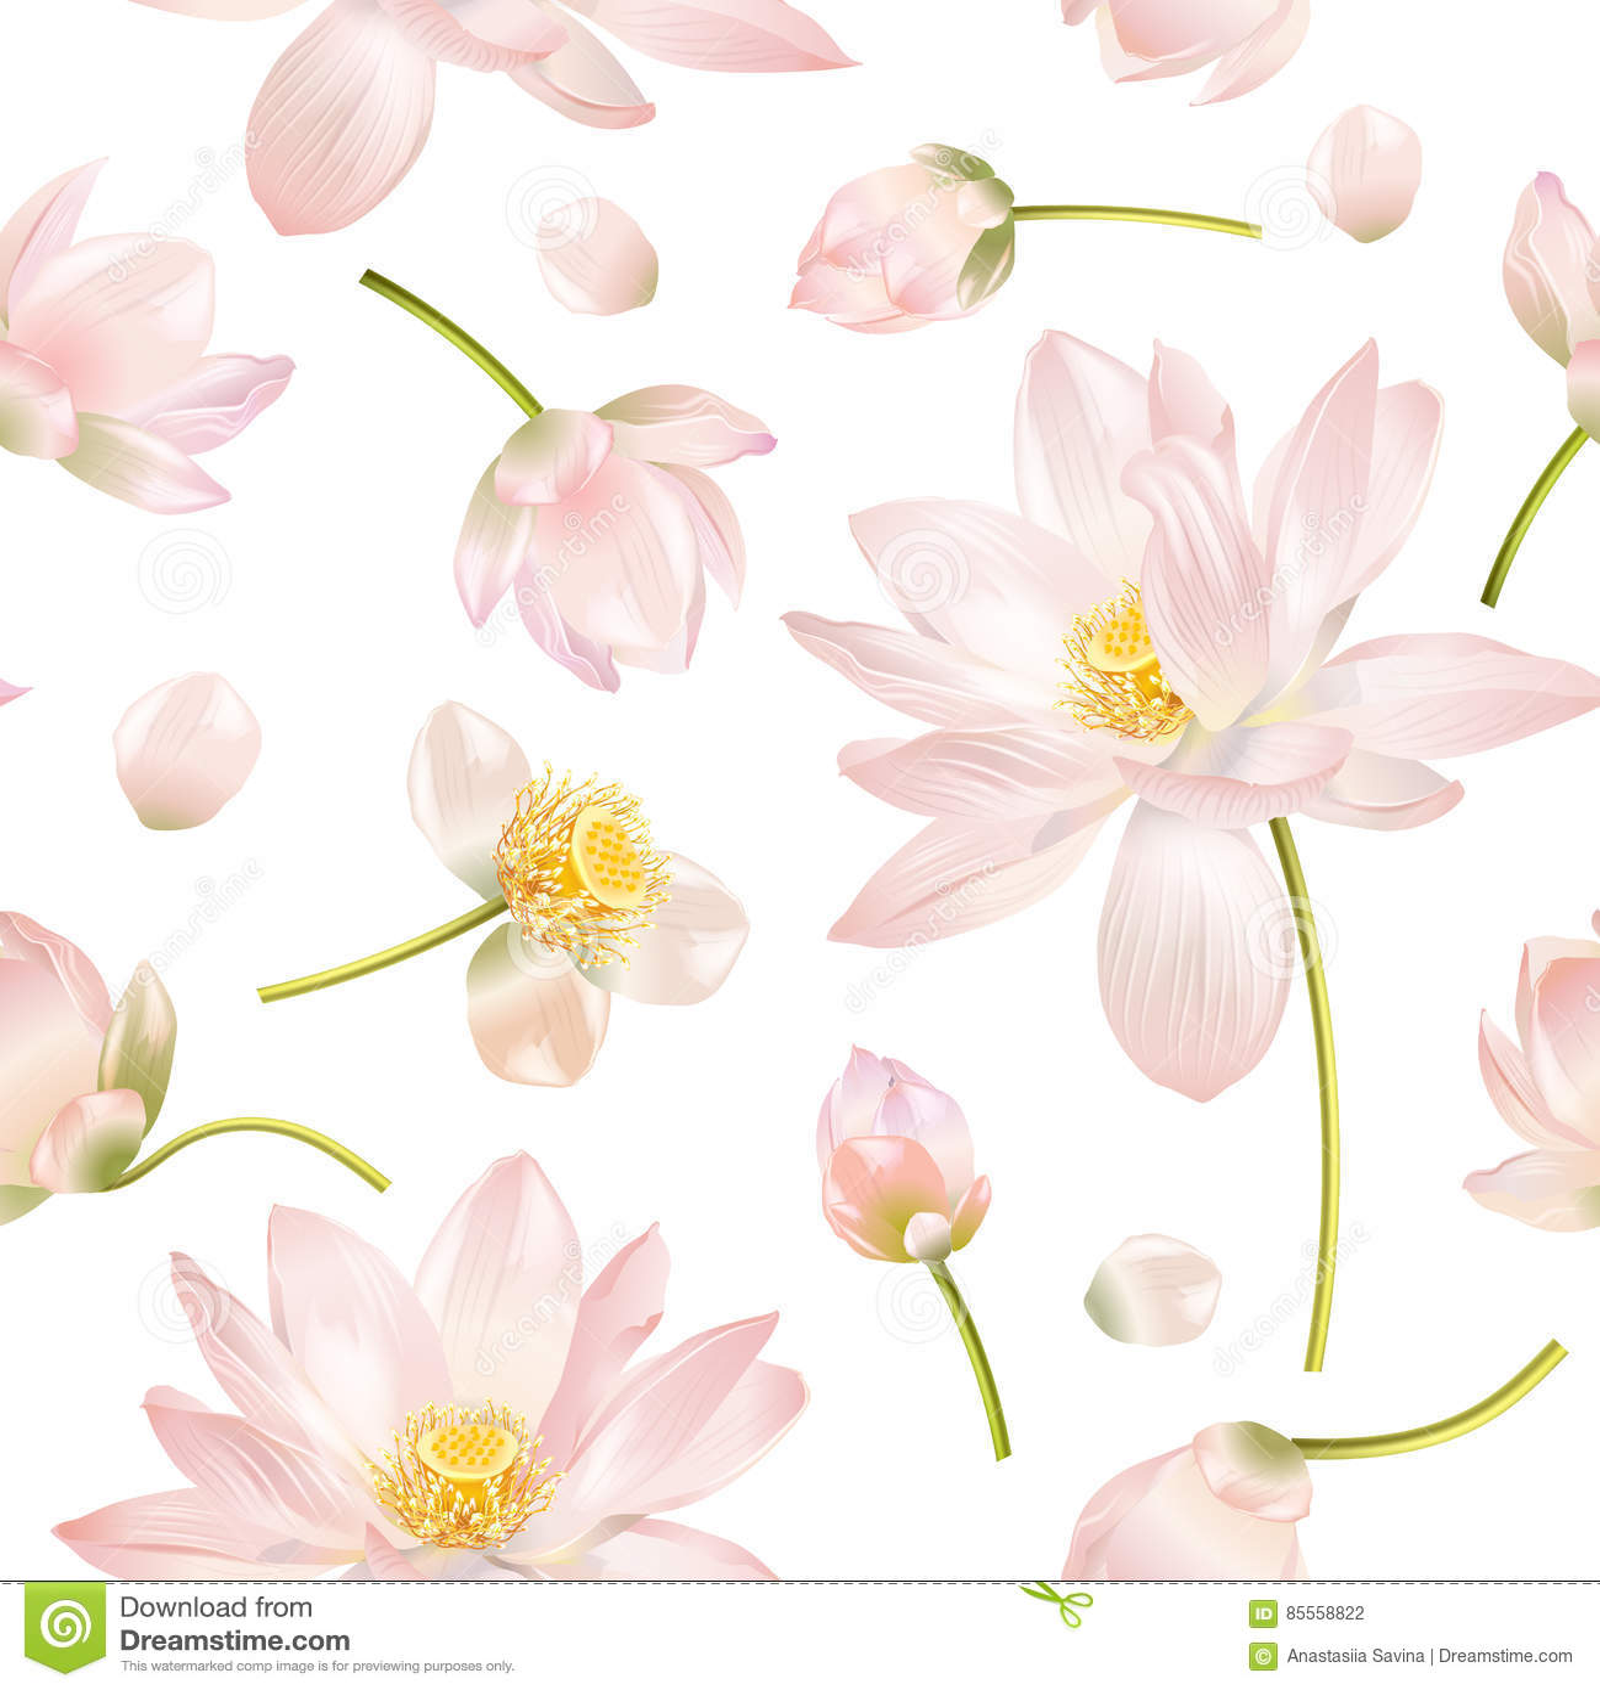 Realistische Illustration Lotuss